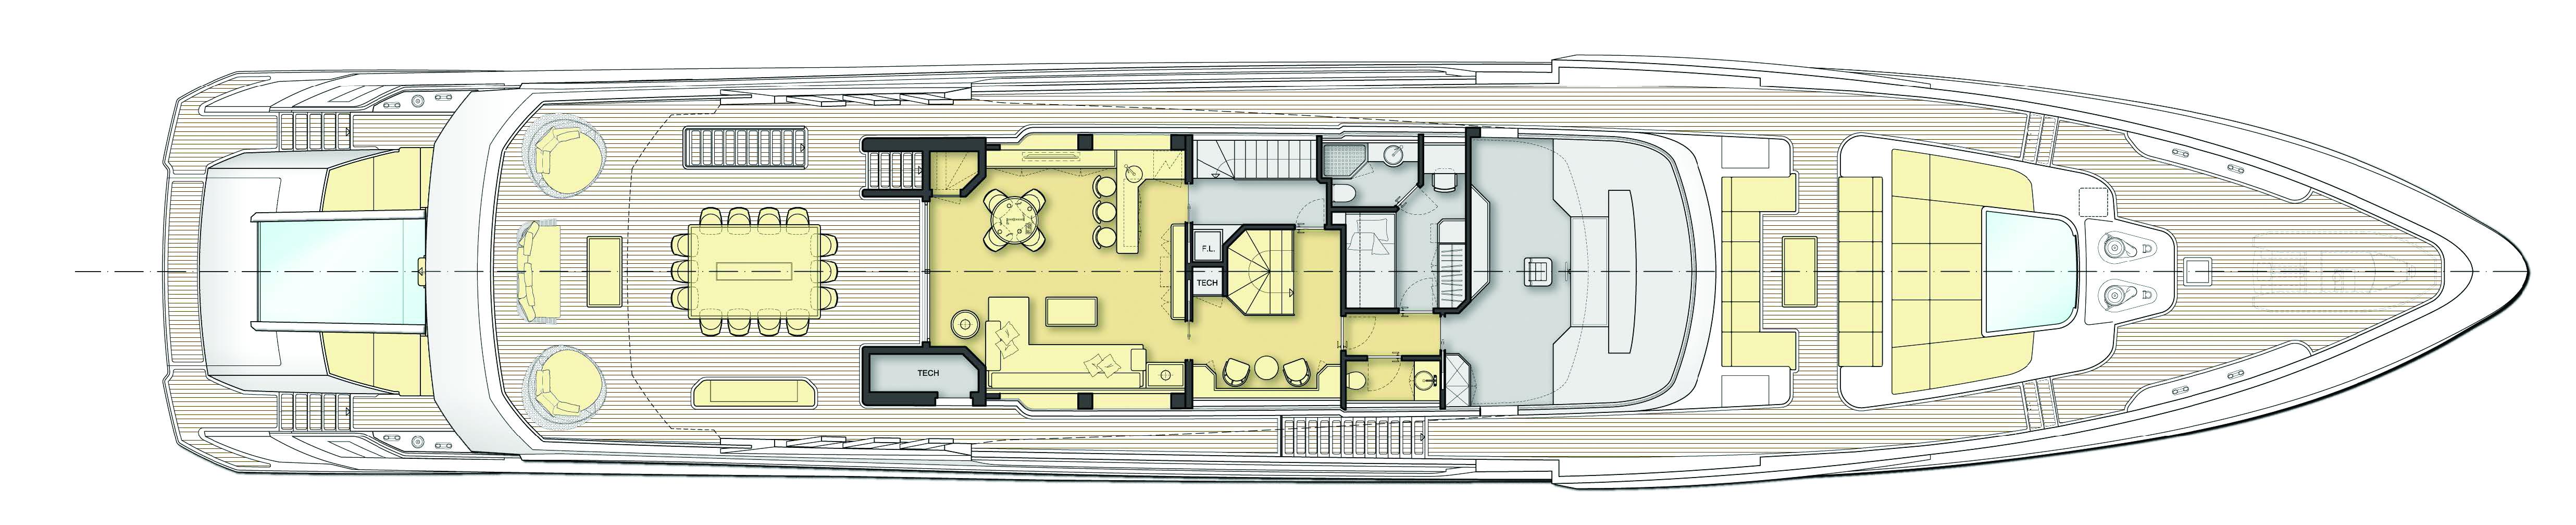 THUNDERBIRD_165_upper deck